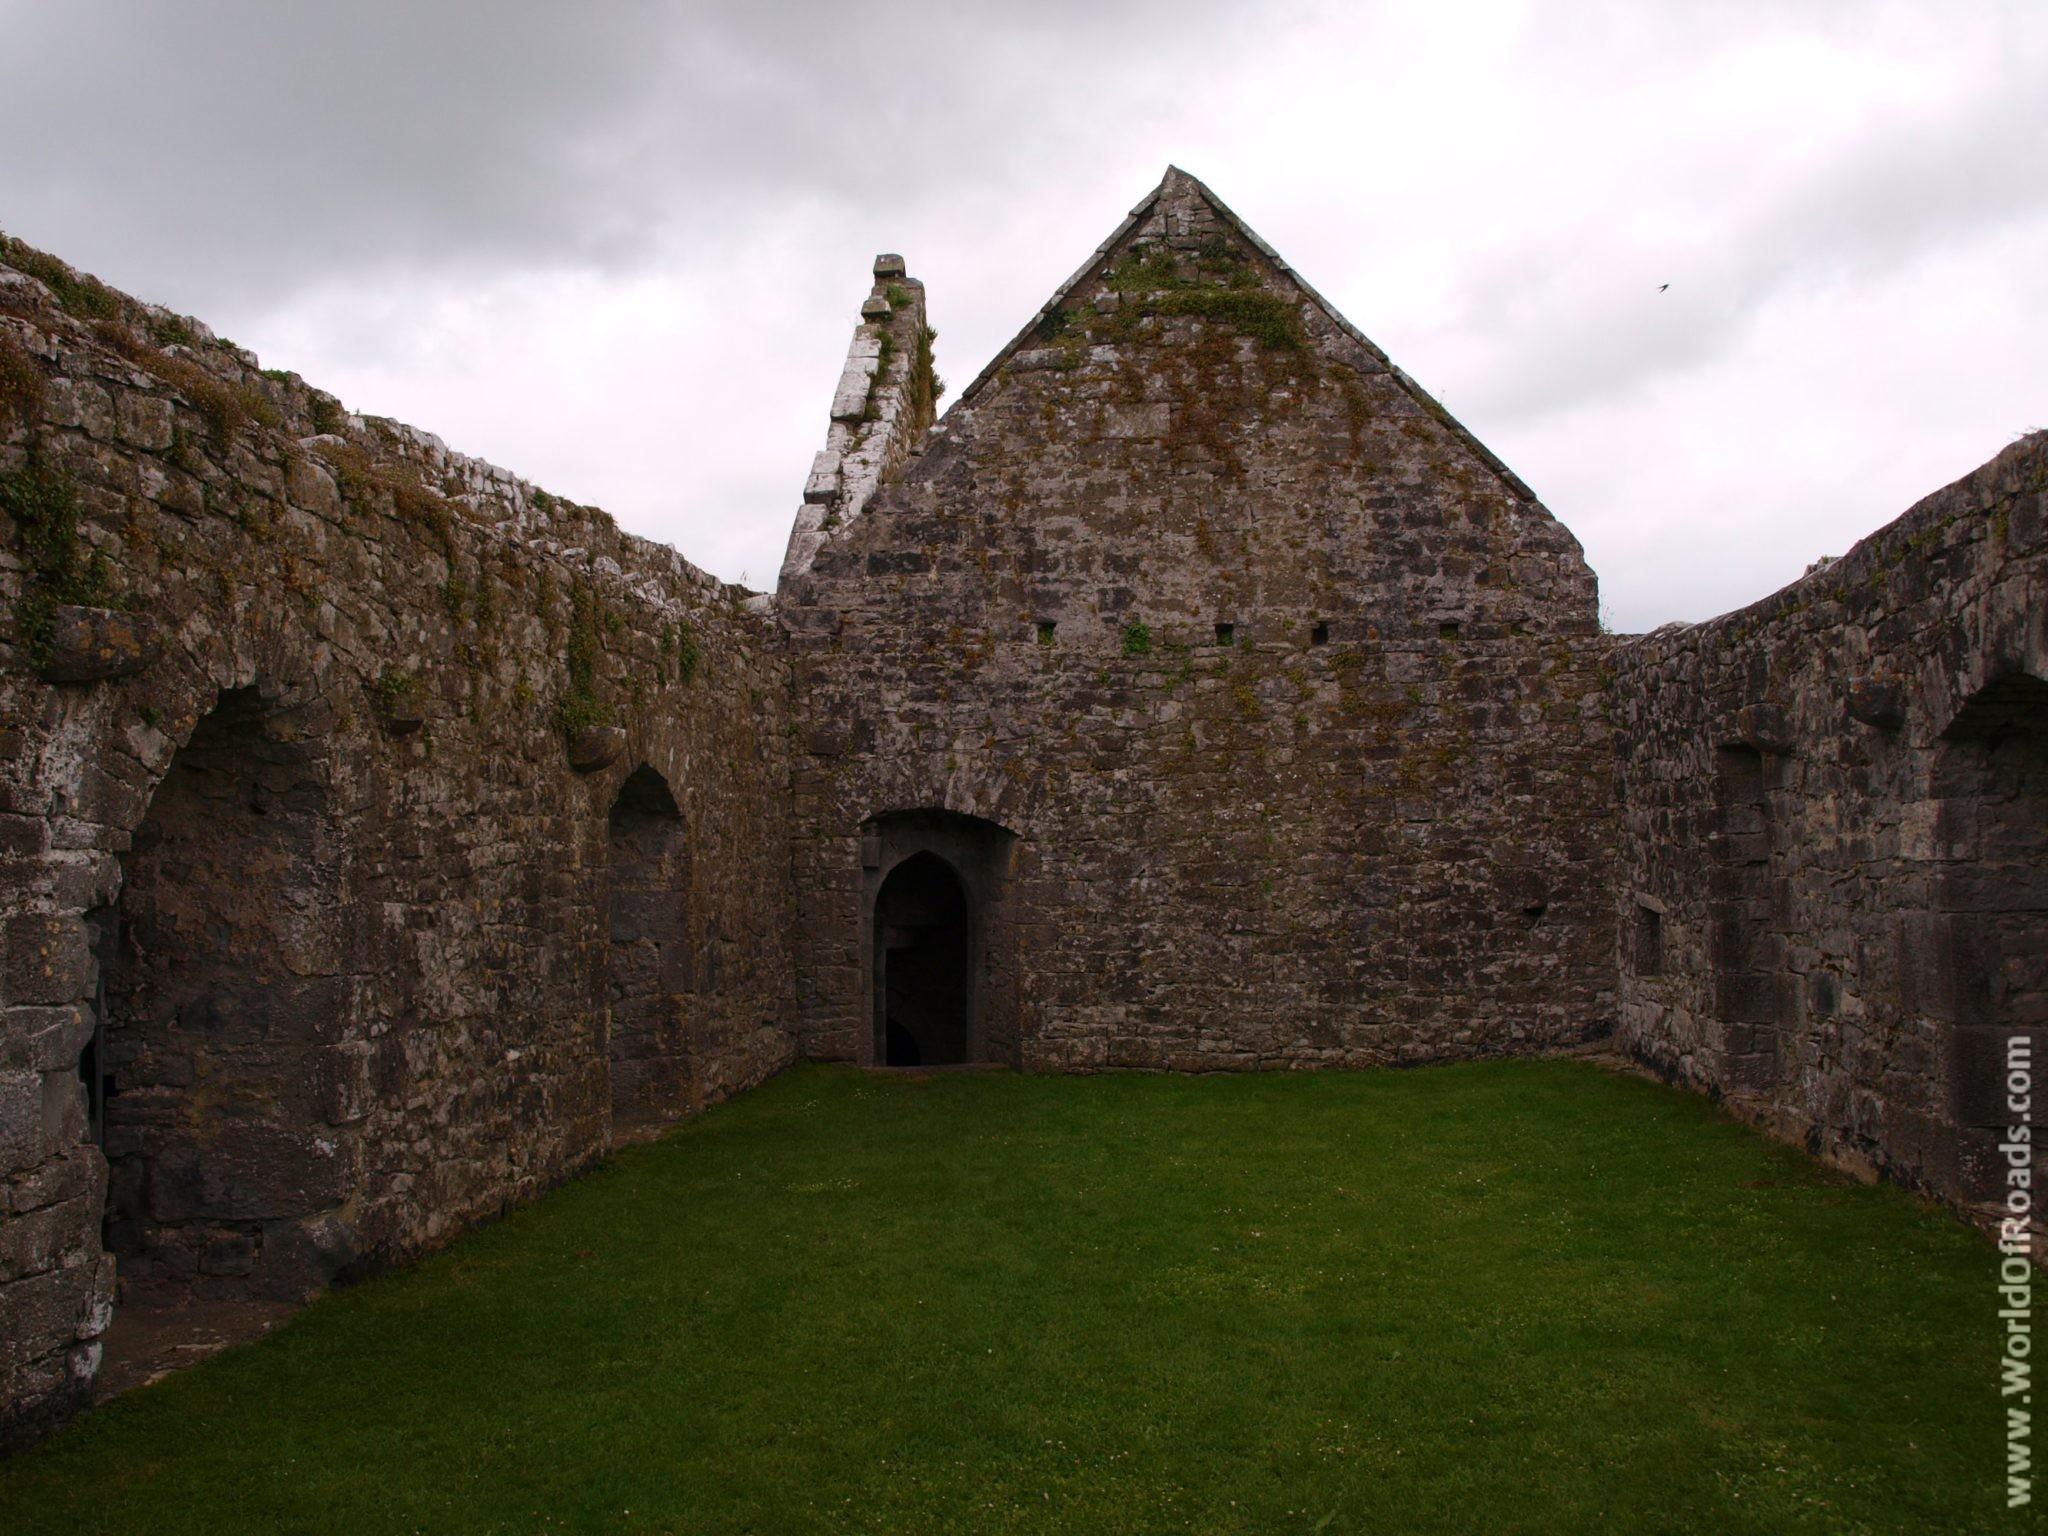 Внутри Аббатства Квин. Графство Клэр. Ирландия.